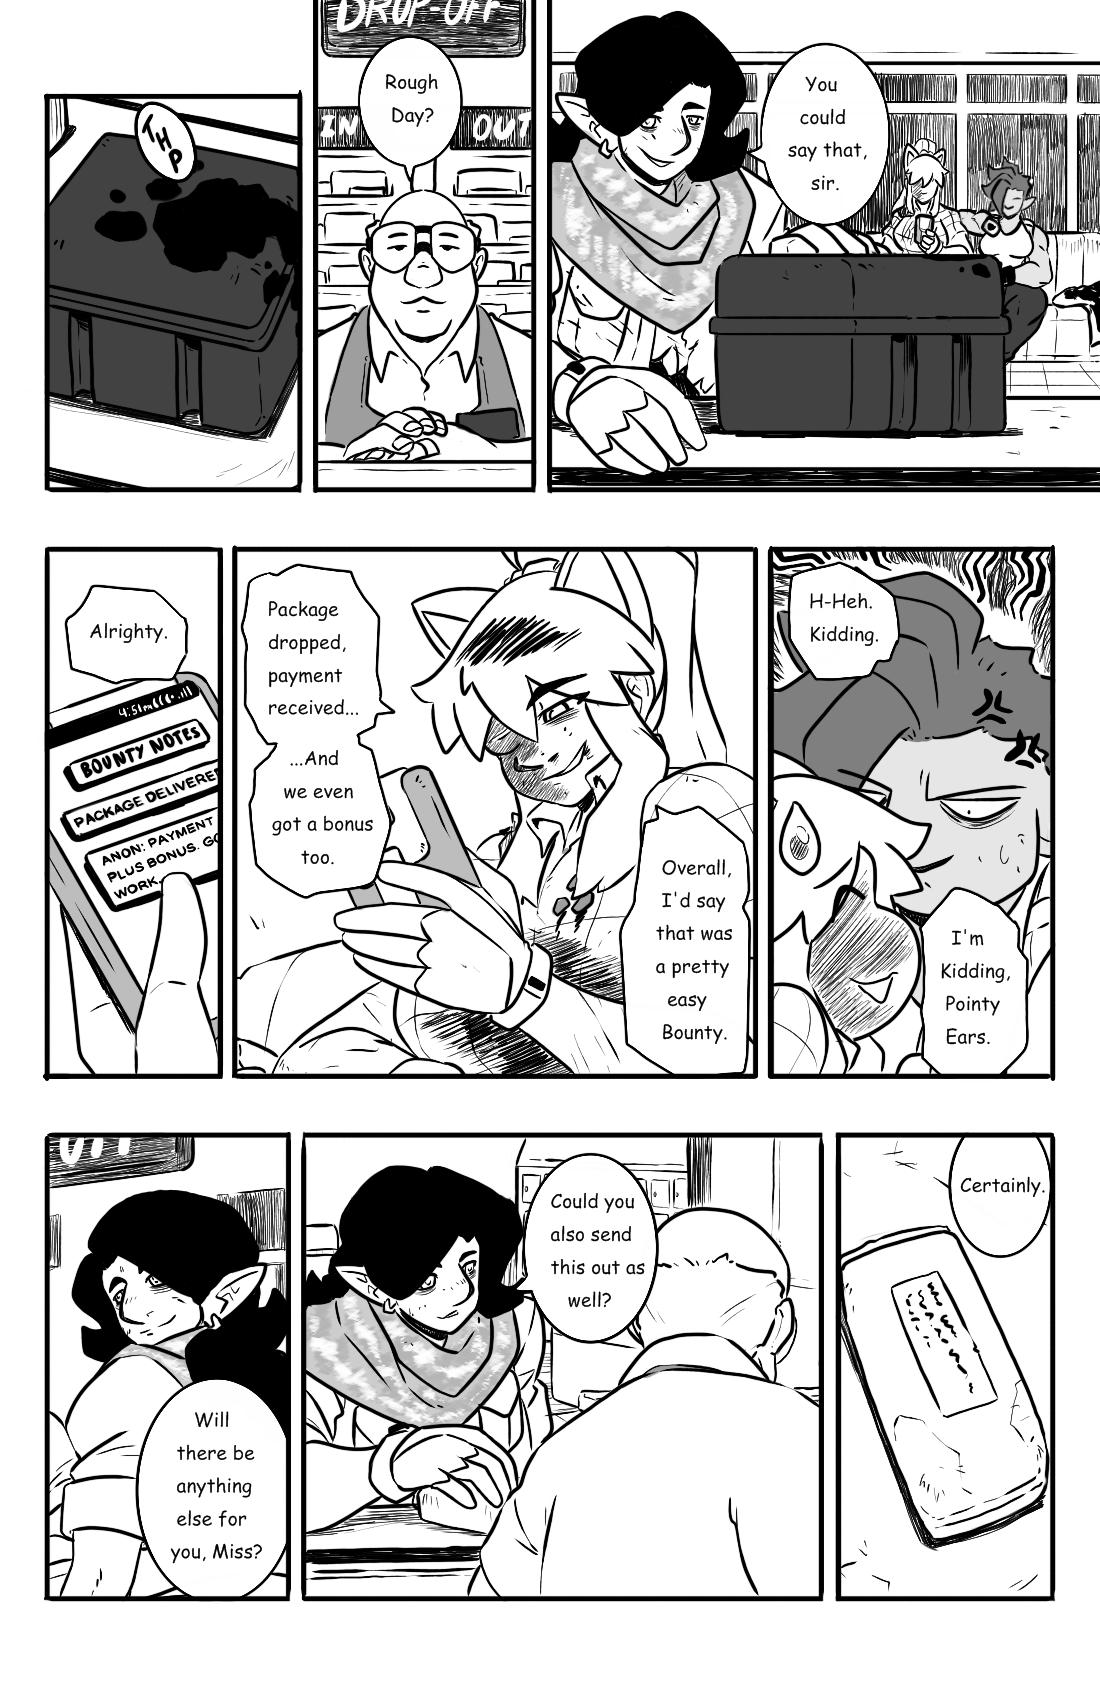 Pony Express Part 3 pg.61